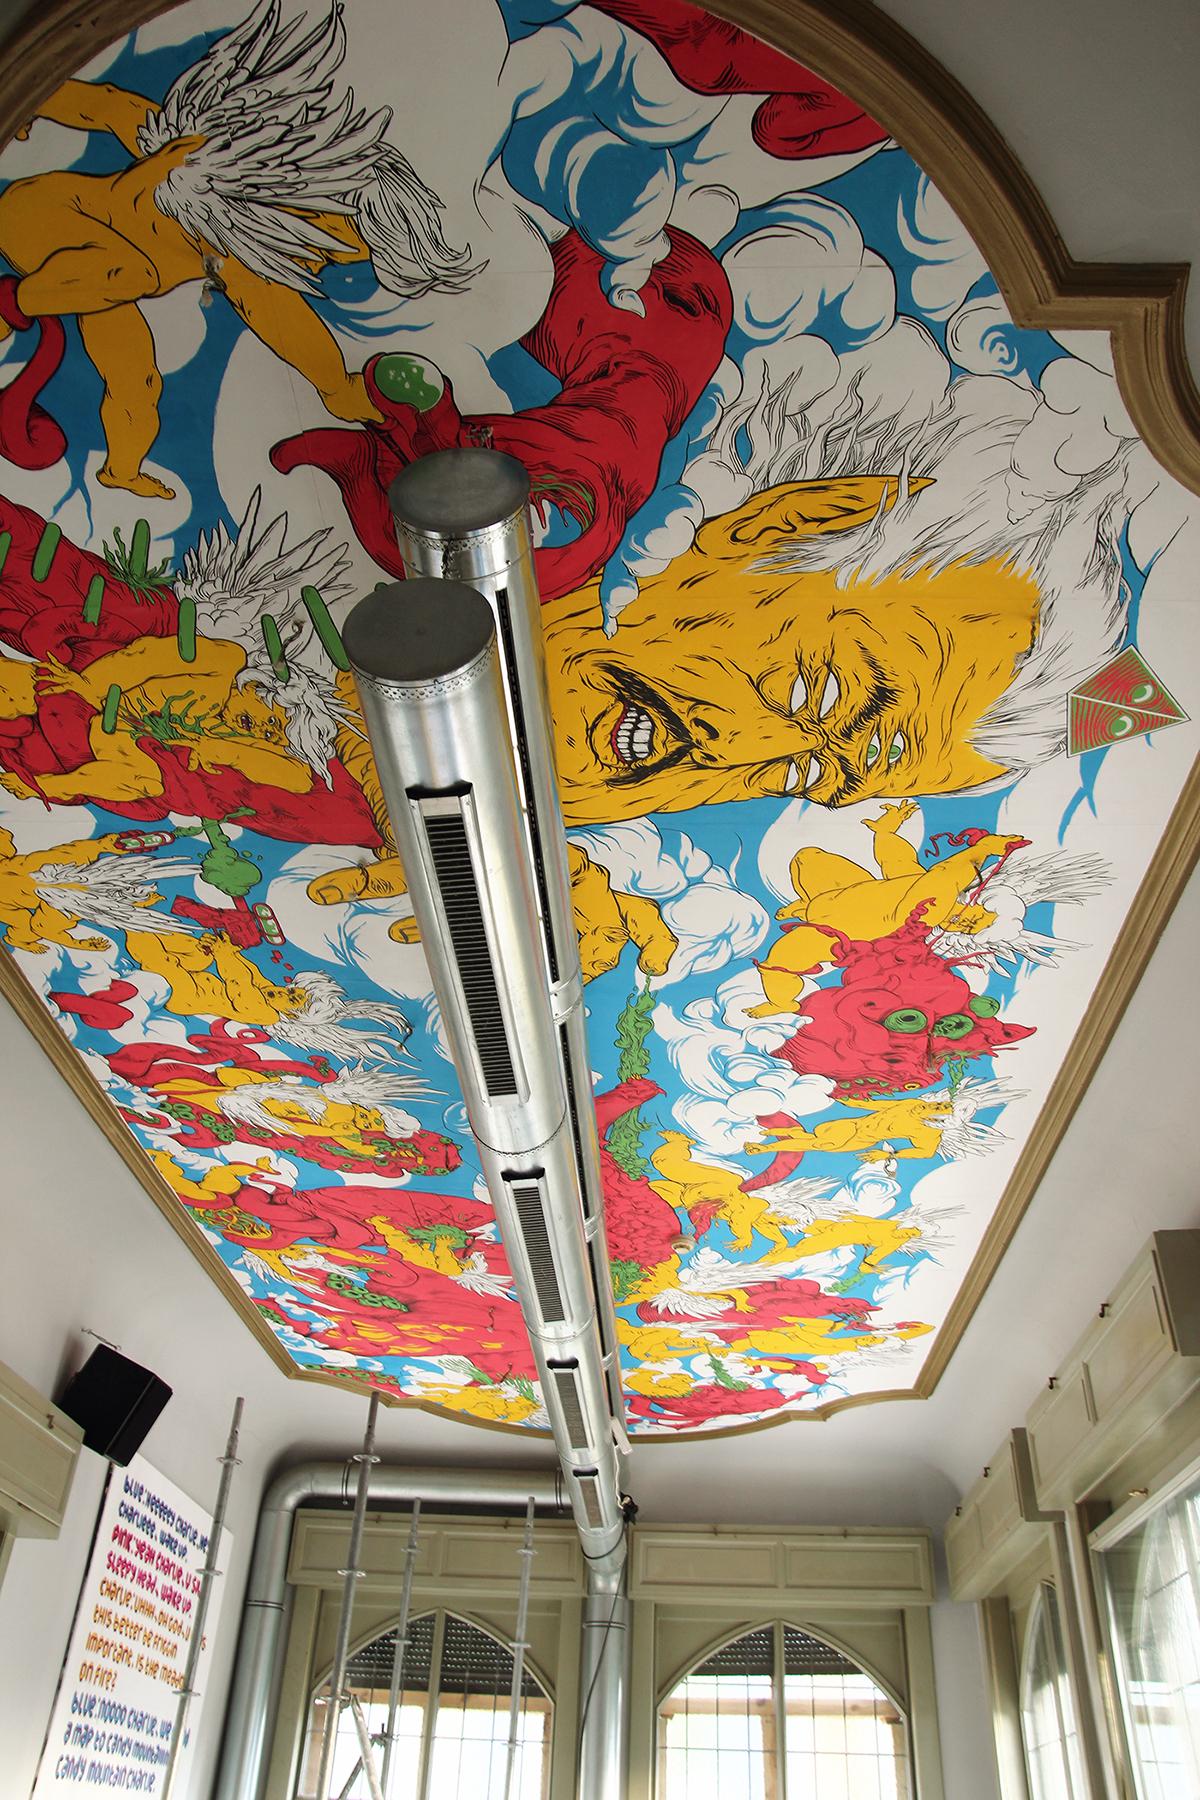 angels alien God fight battle heaven boss lazer furniture cats ninja cafe bar pub ceiling